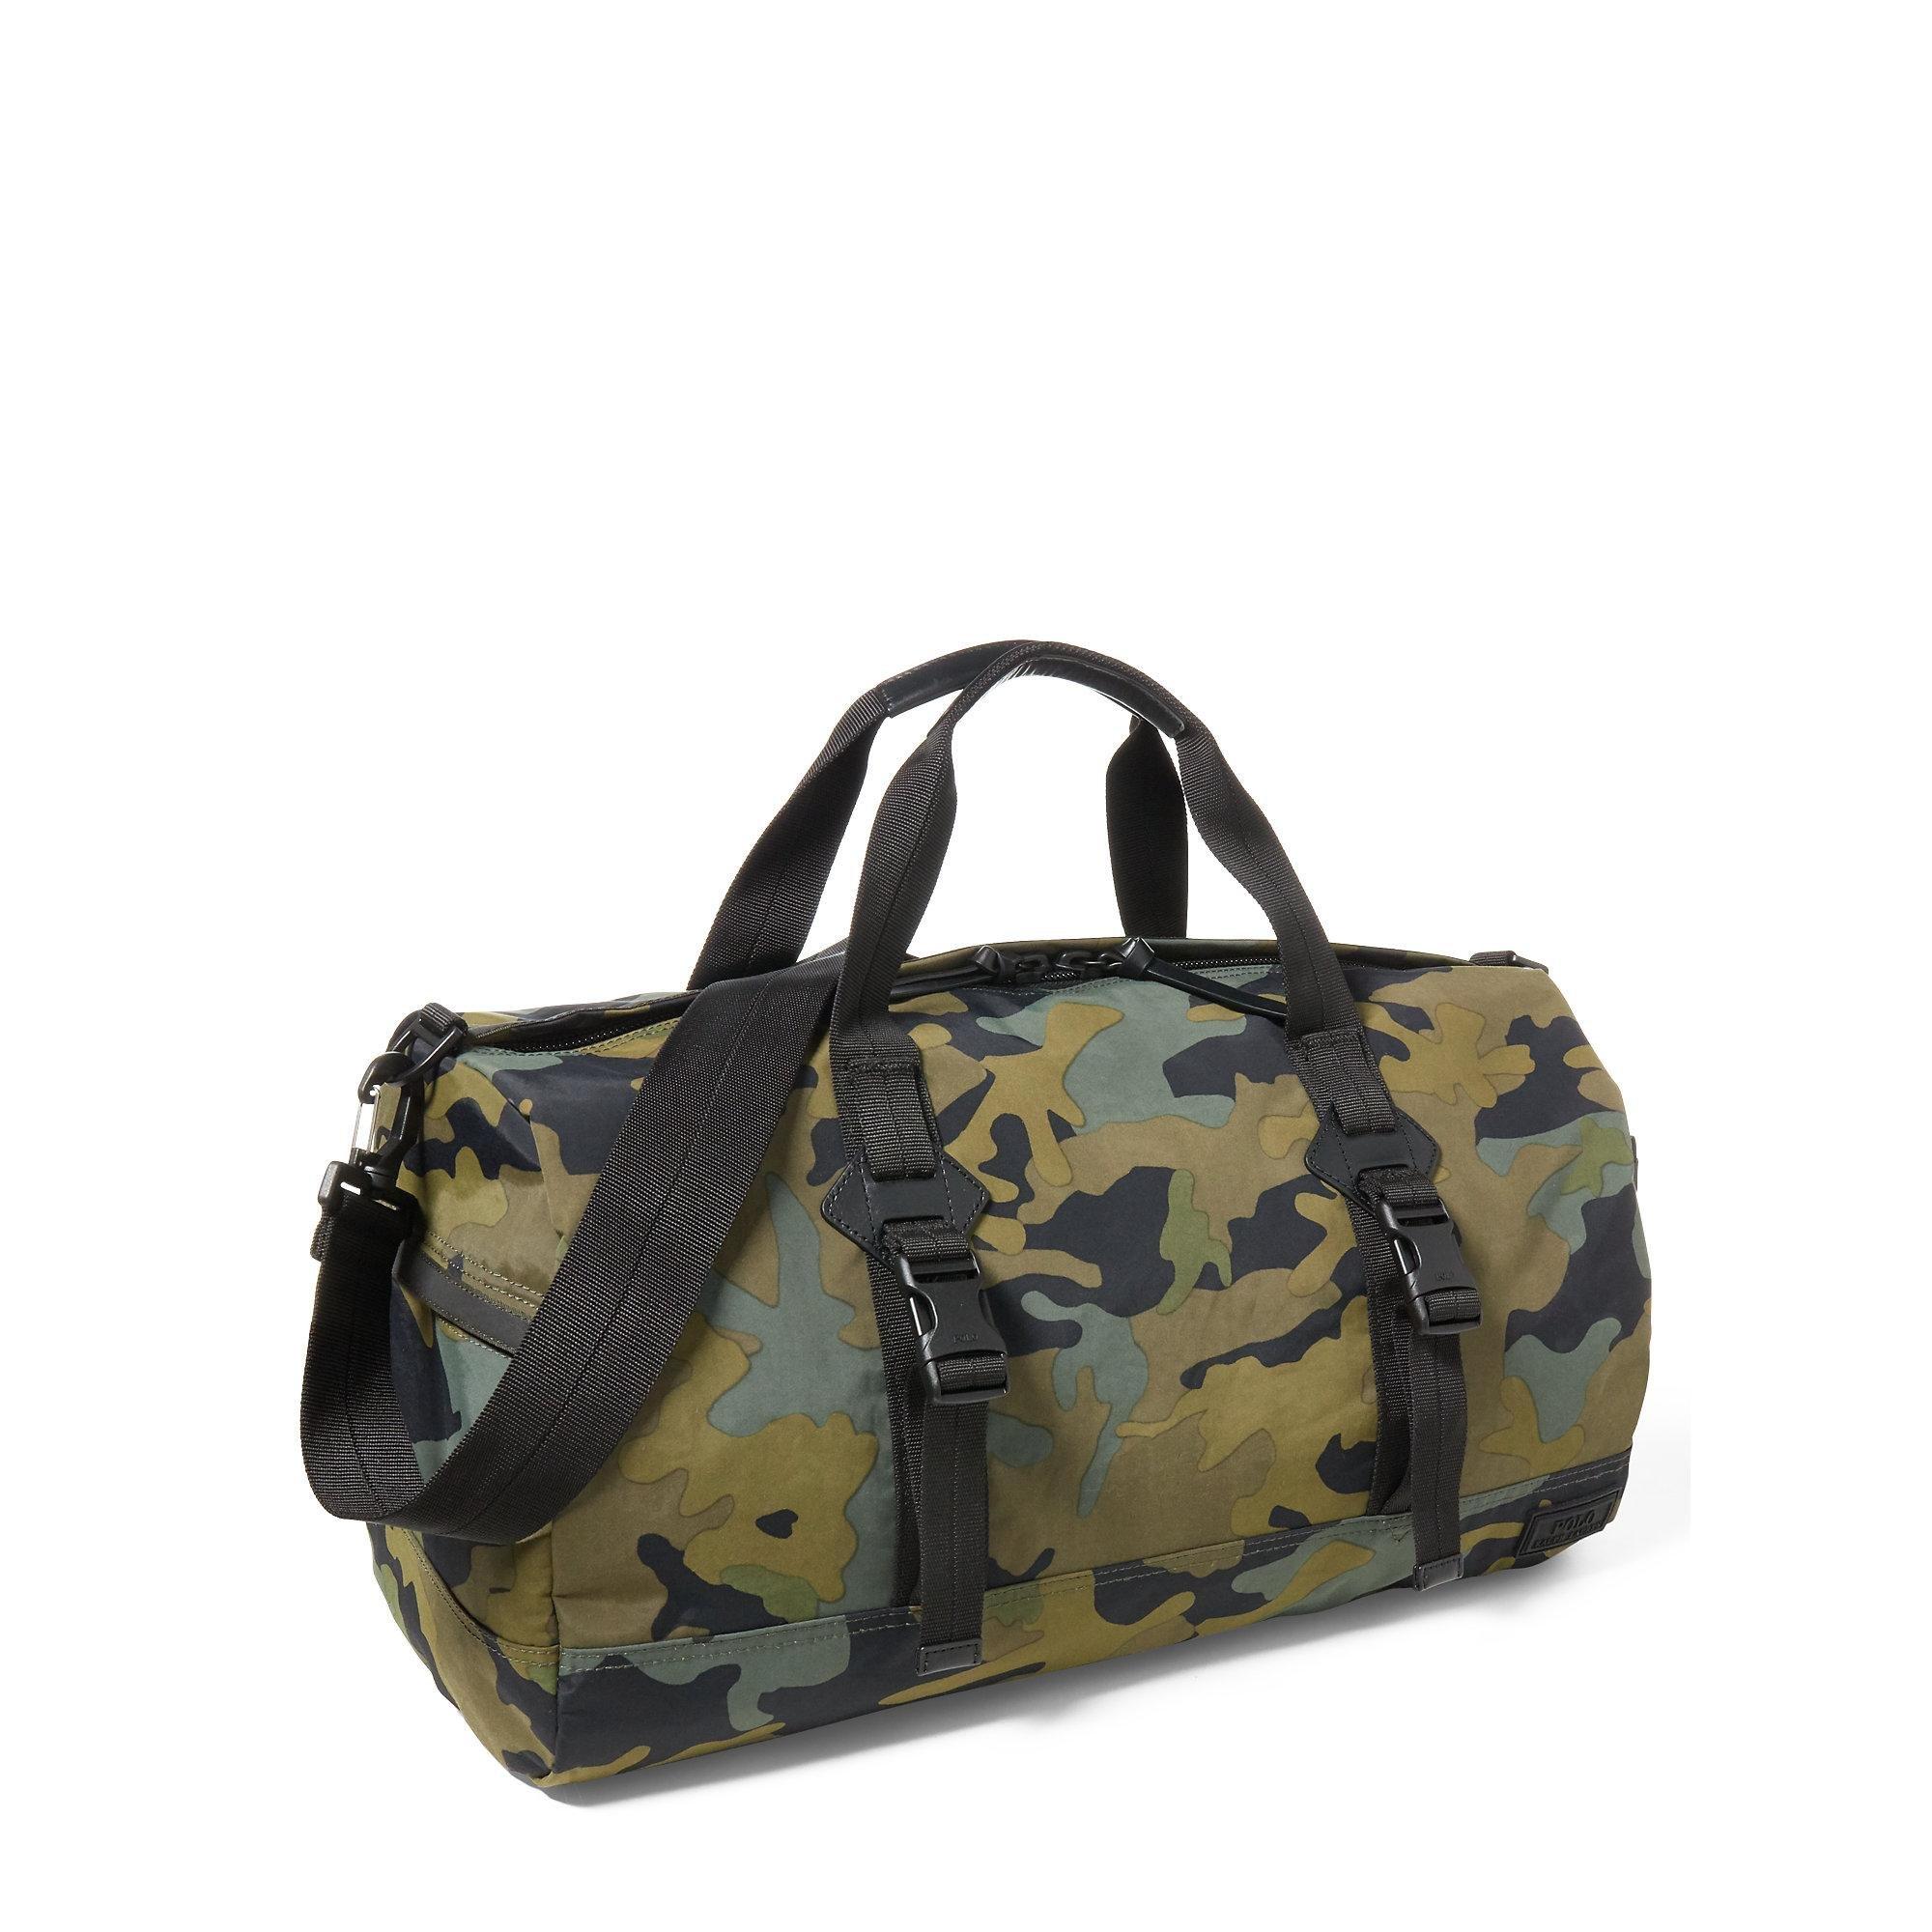 24ffef9ec60 ... switzerland lyst polo ralph lauren nylon city explorer duffel bag for  men 45efe d8484